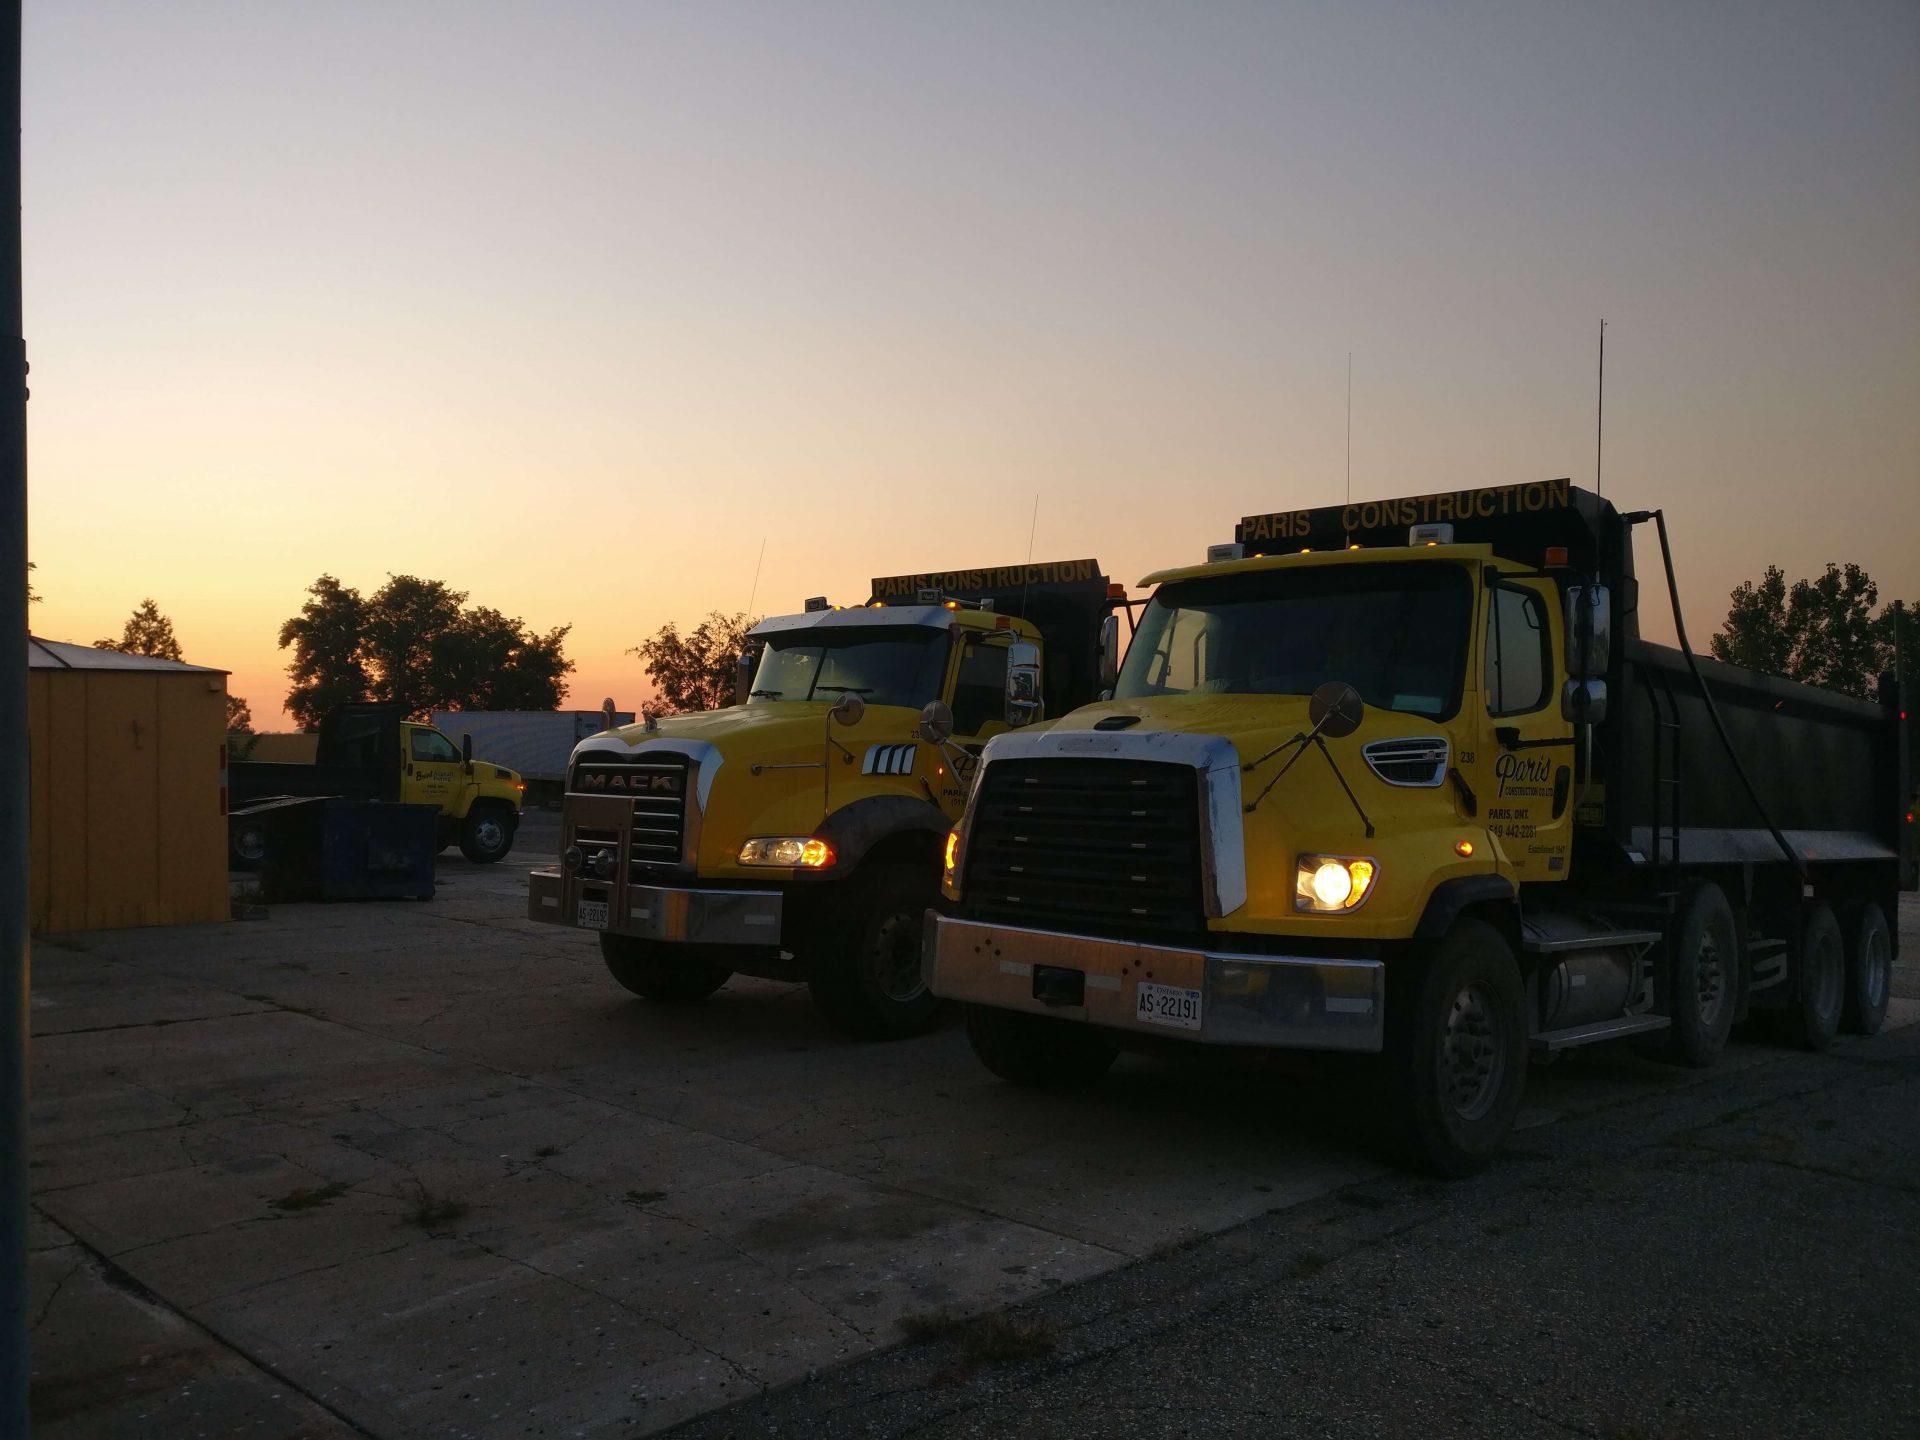 Paris Construction dump trucks at night